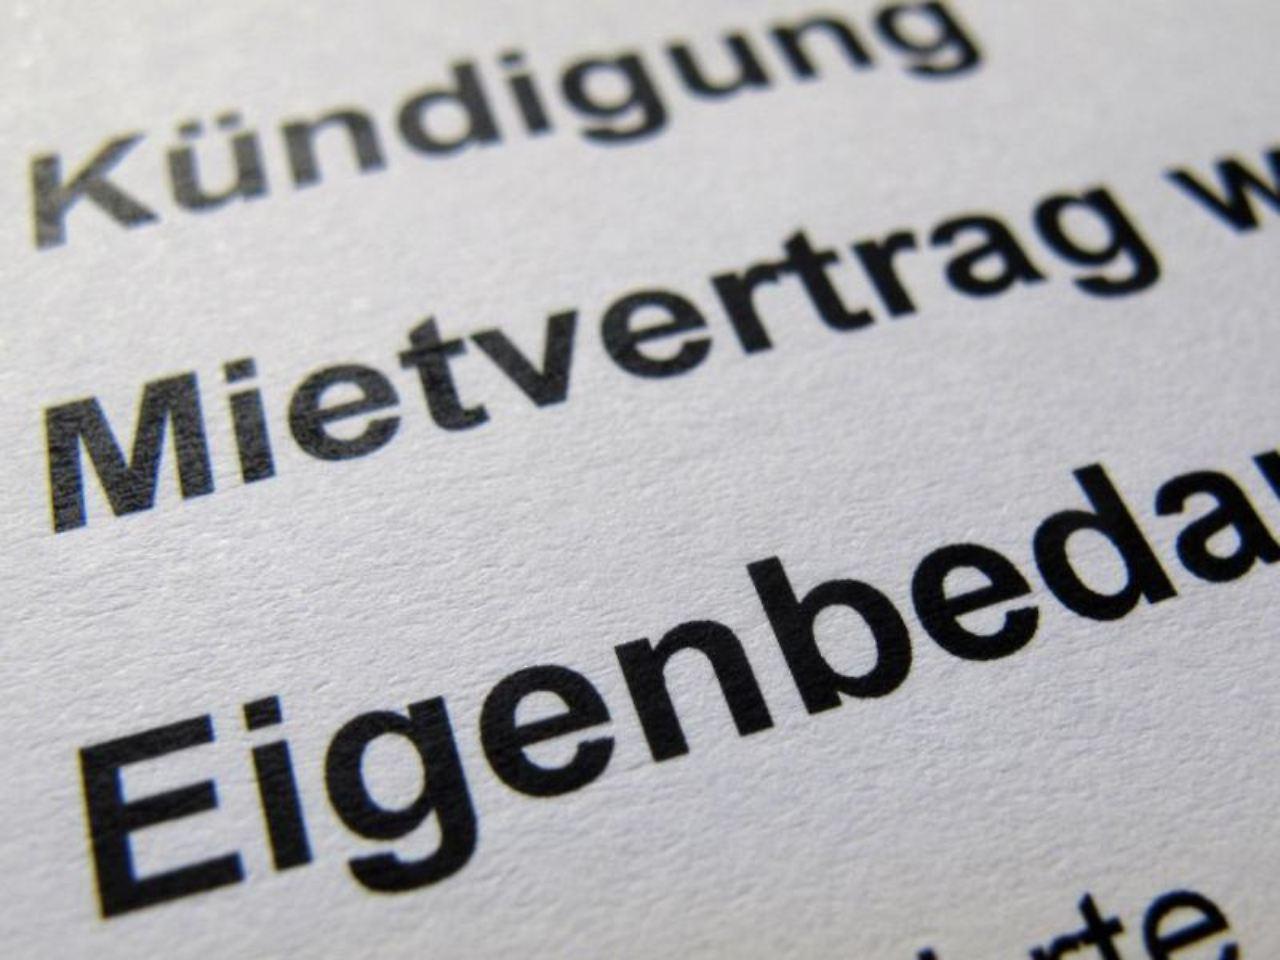 Wer soll einziehen?: Eigenbedarfskündigung: Gründe nennen - n-tv.de